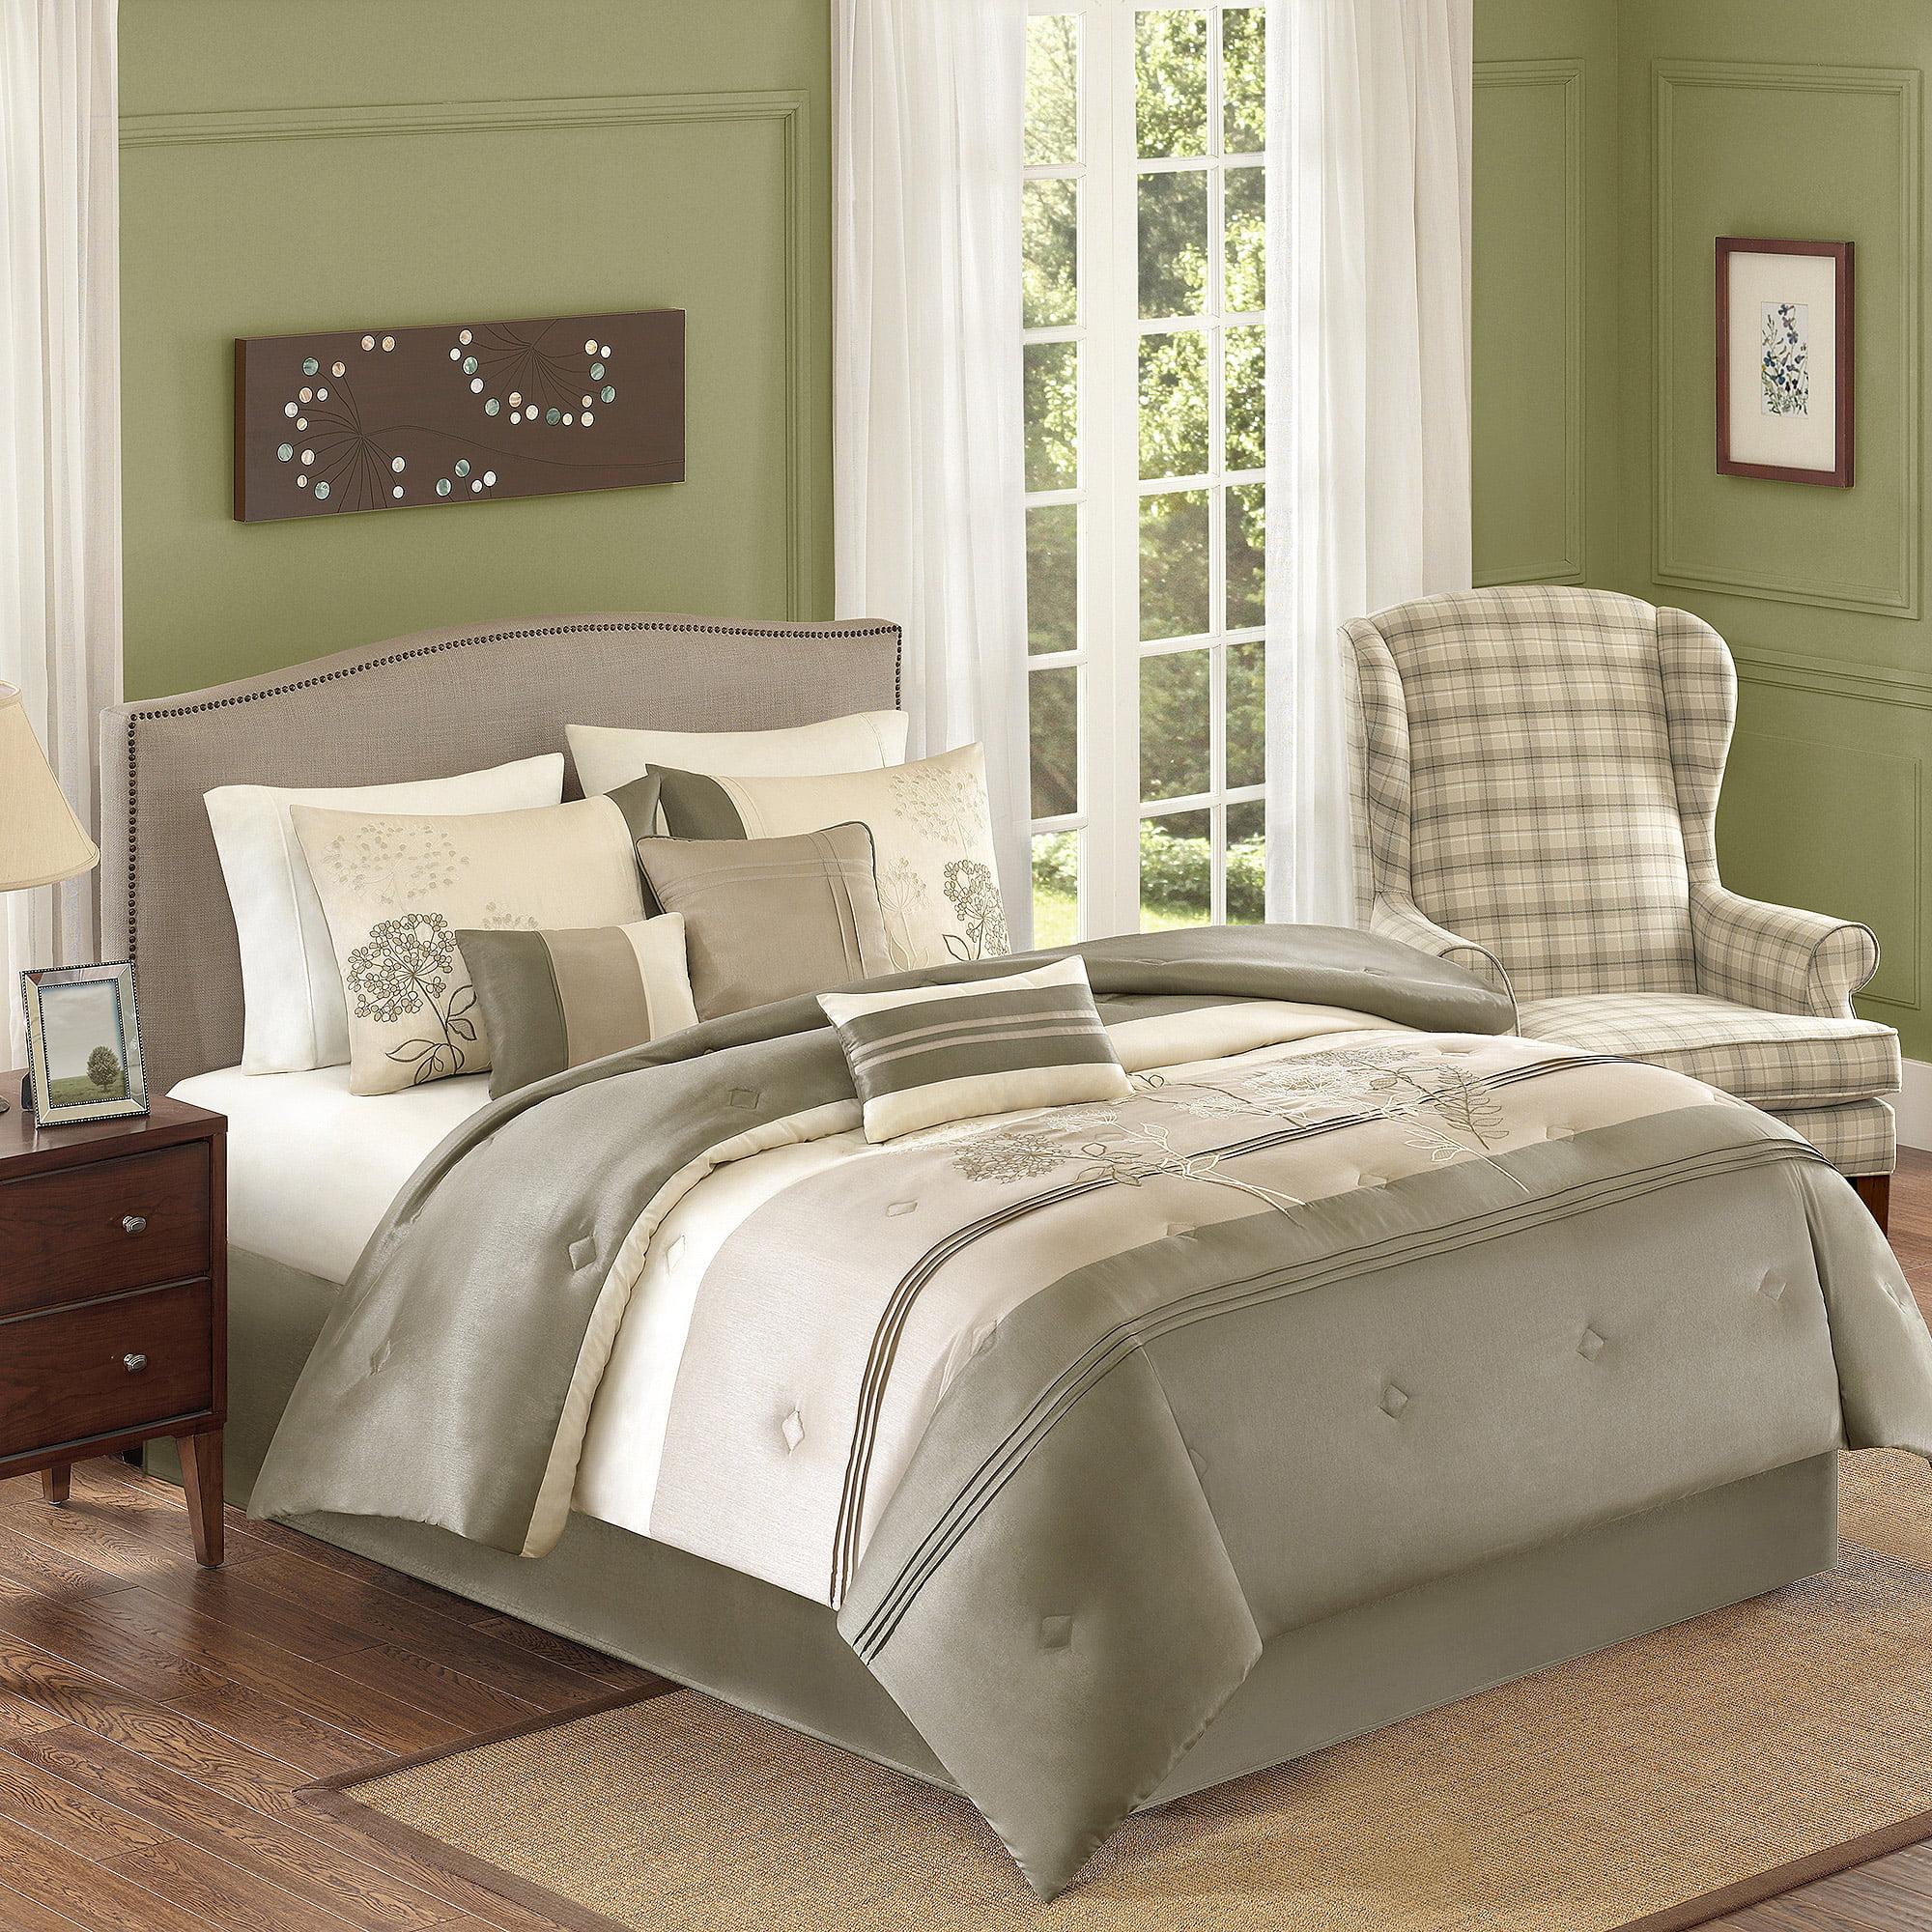 Better Homes and Gardens Jelissa 7-Piece Bedding Comforter Set, Beige